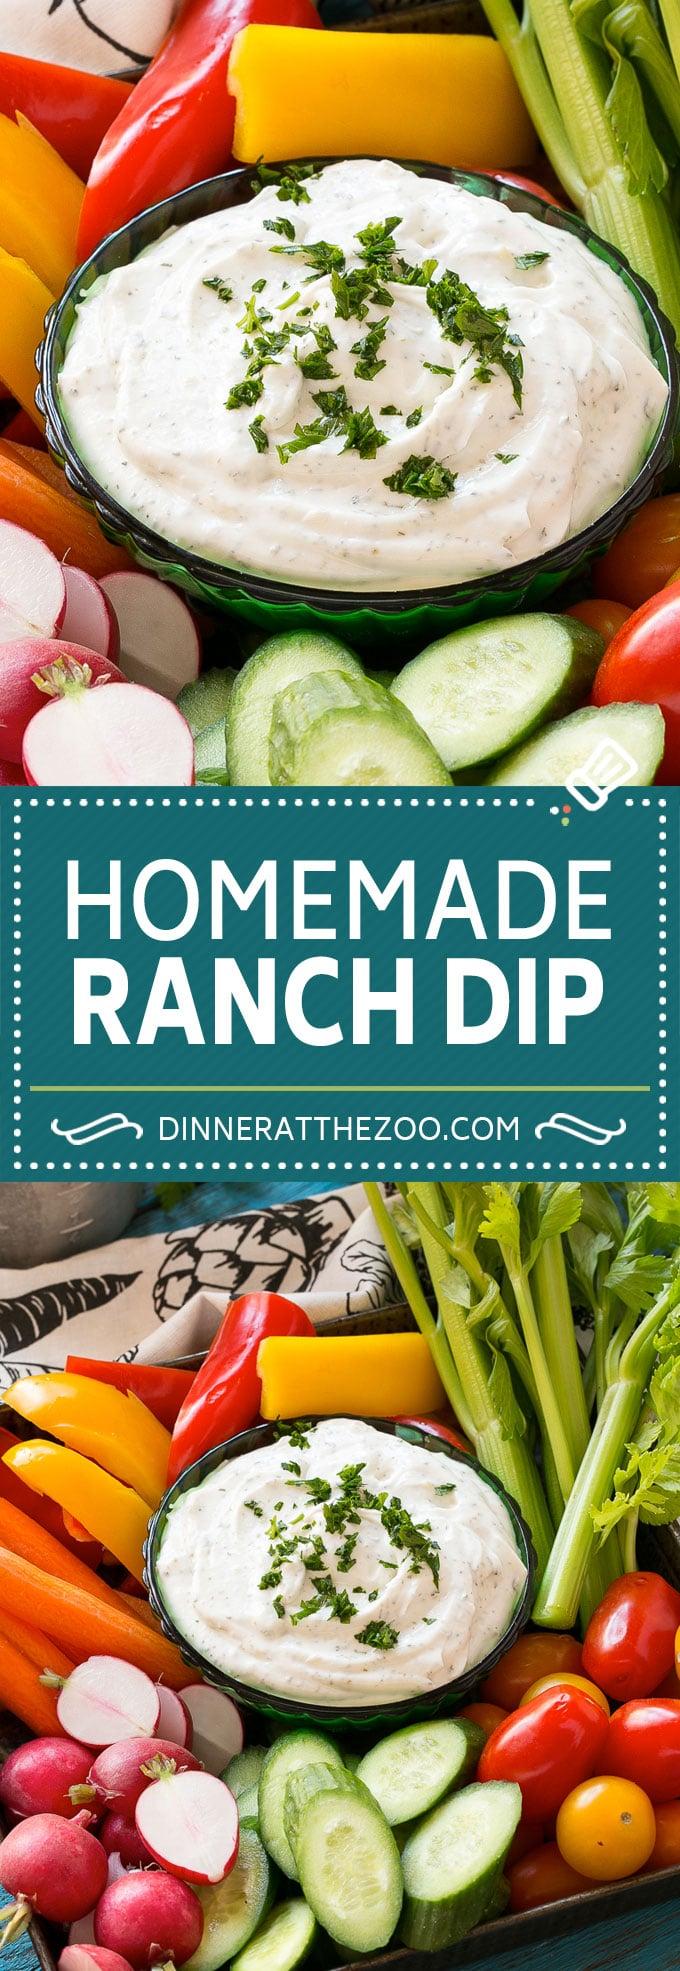 Ranch Dip Recipe | Veggie Dip #ranch #dip #appetizer #snack #dinneratthezoo